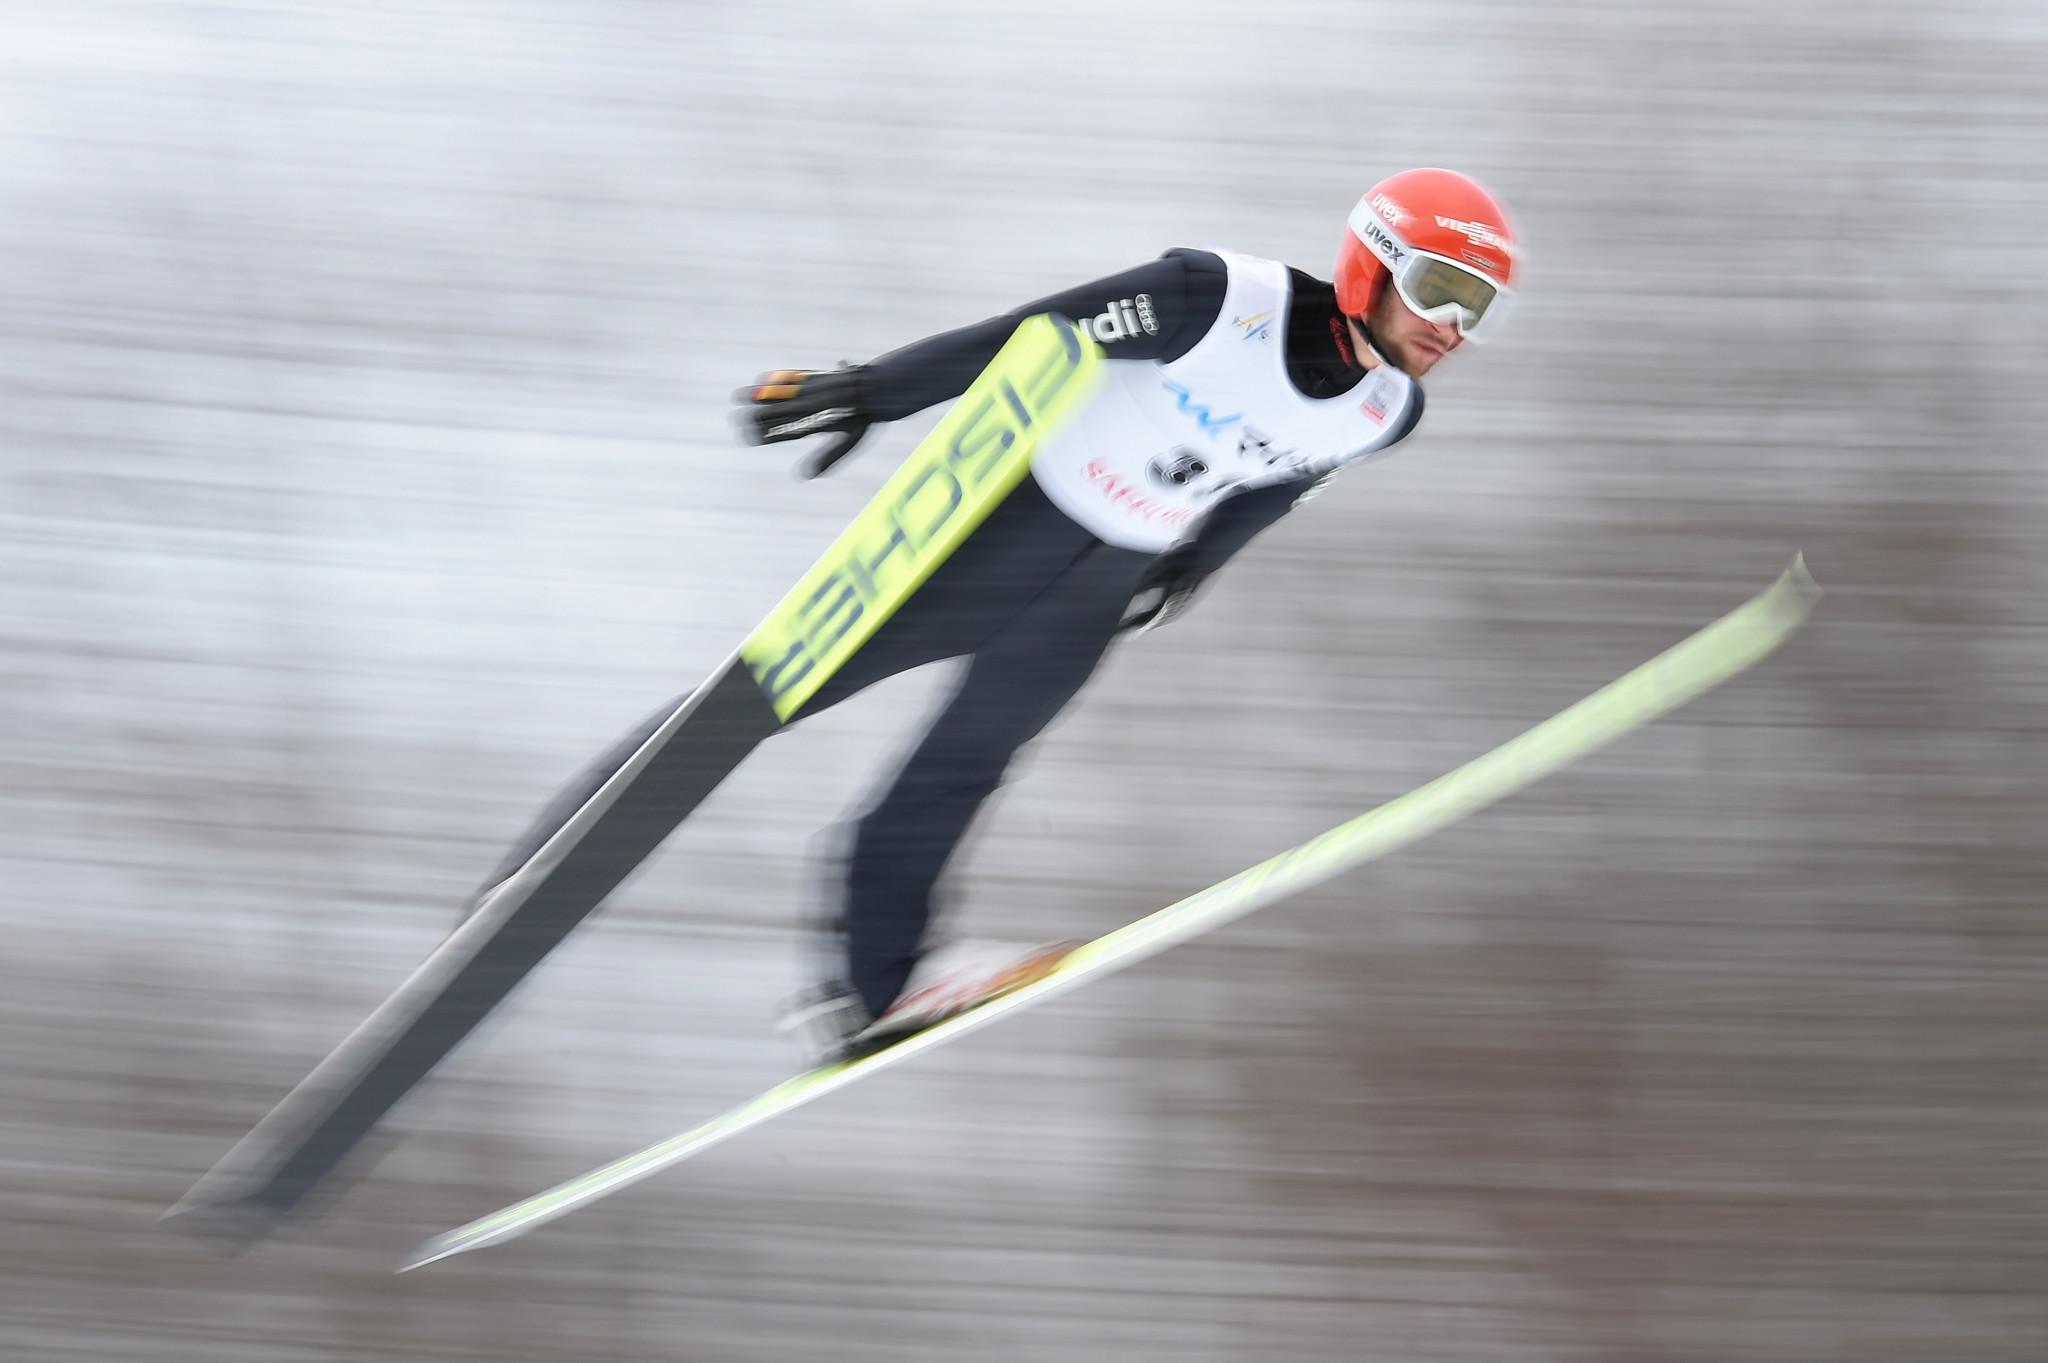 Eisenbichler bidding to continue fine start to Ski Jumping World Cup season in Ruka